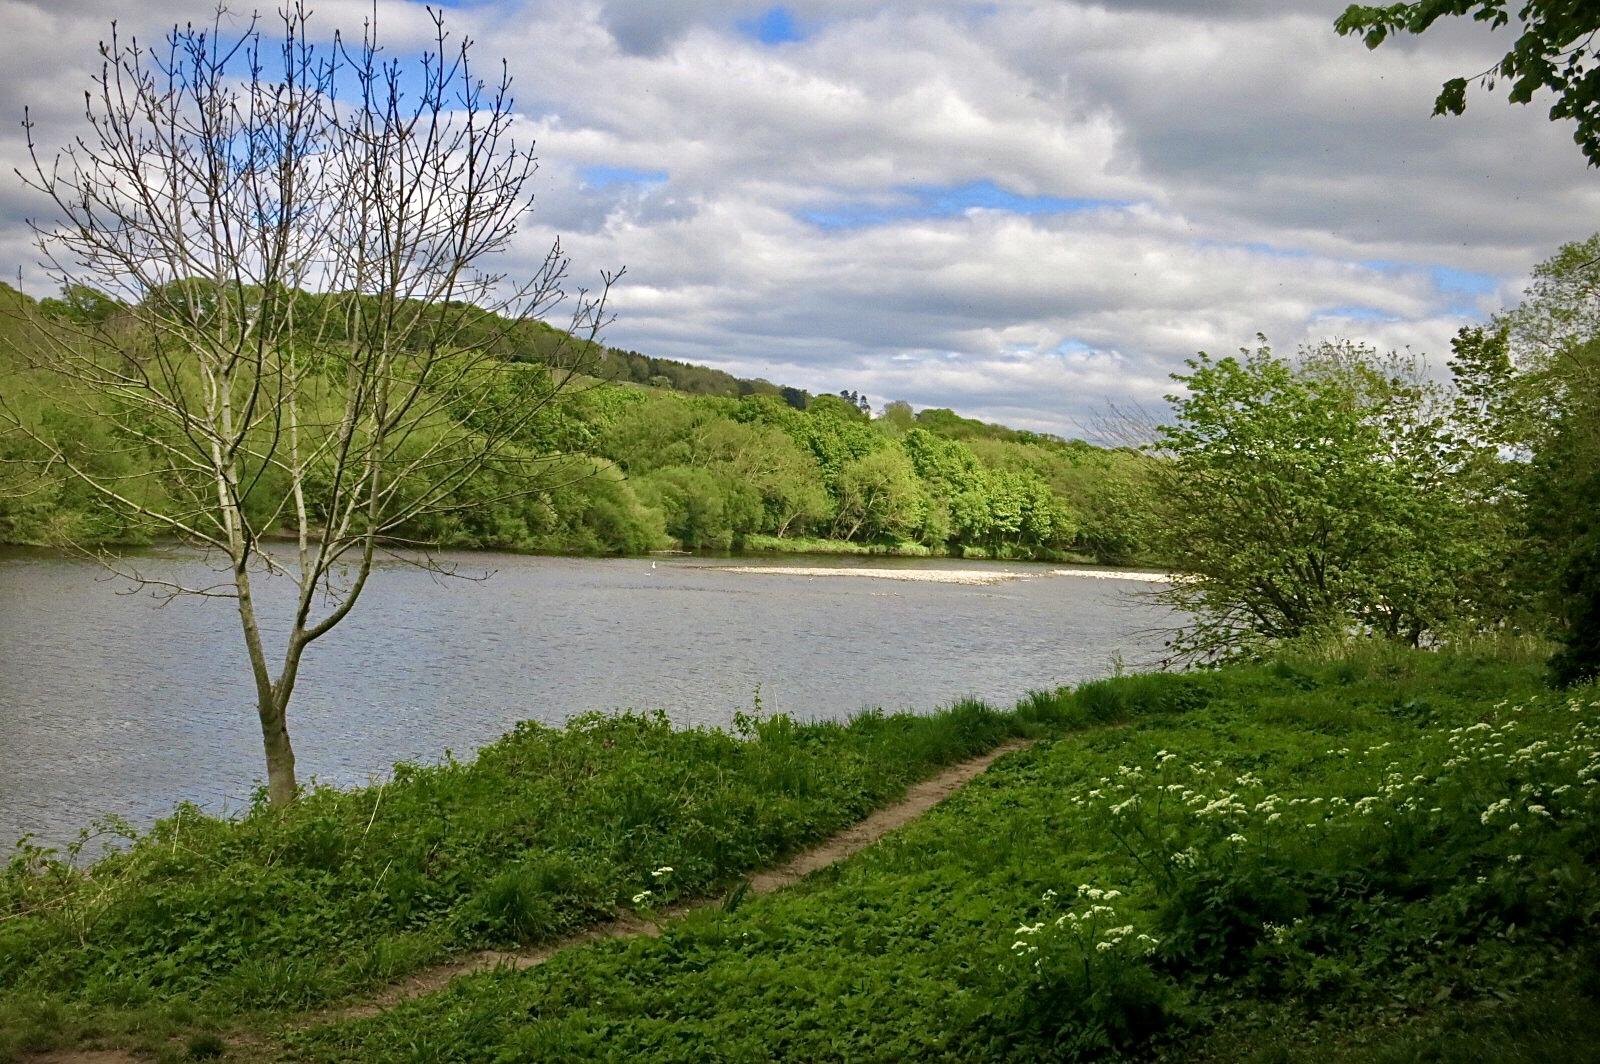 The river Tyne. hexham